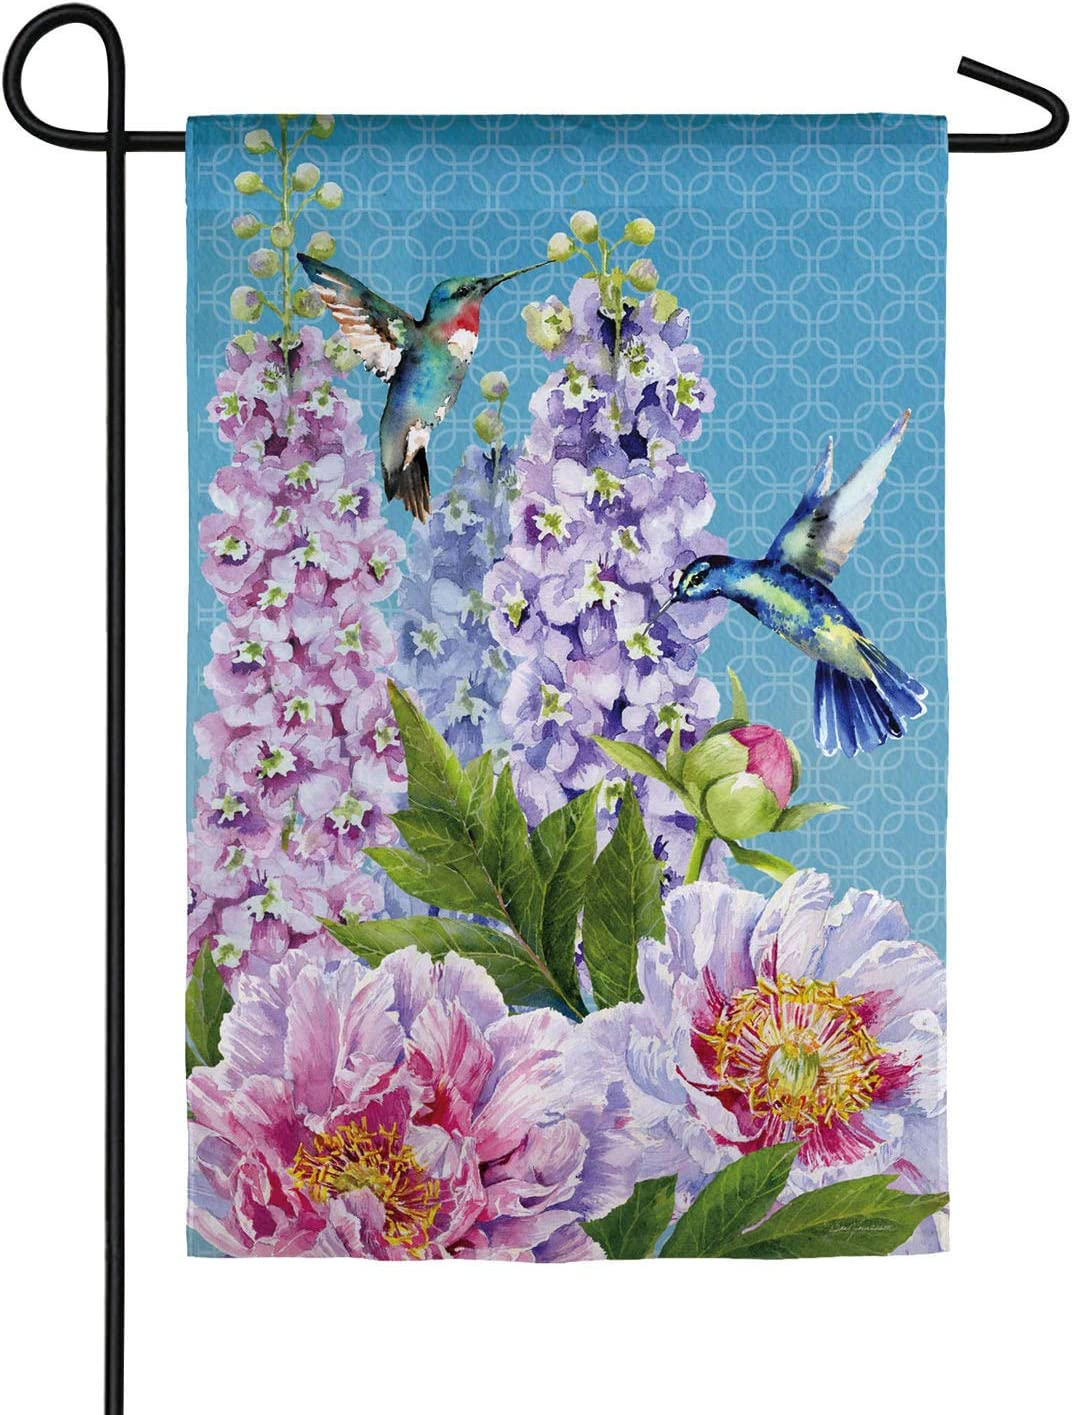 Peonies & Hummingbirds Garden Suede Flag - 13 x 1 x 18 Inches